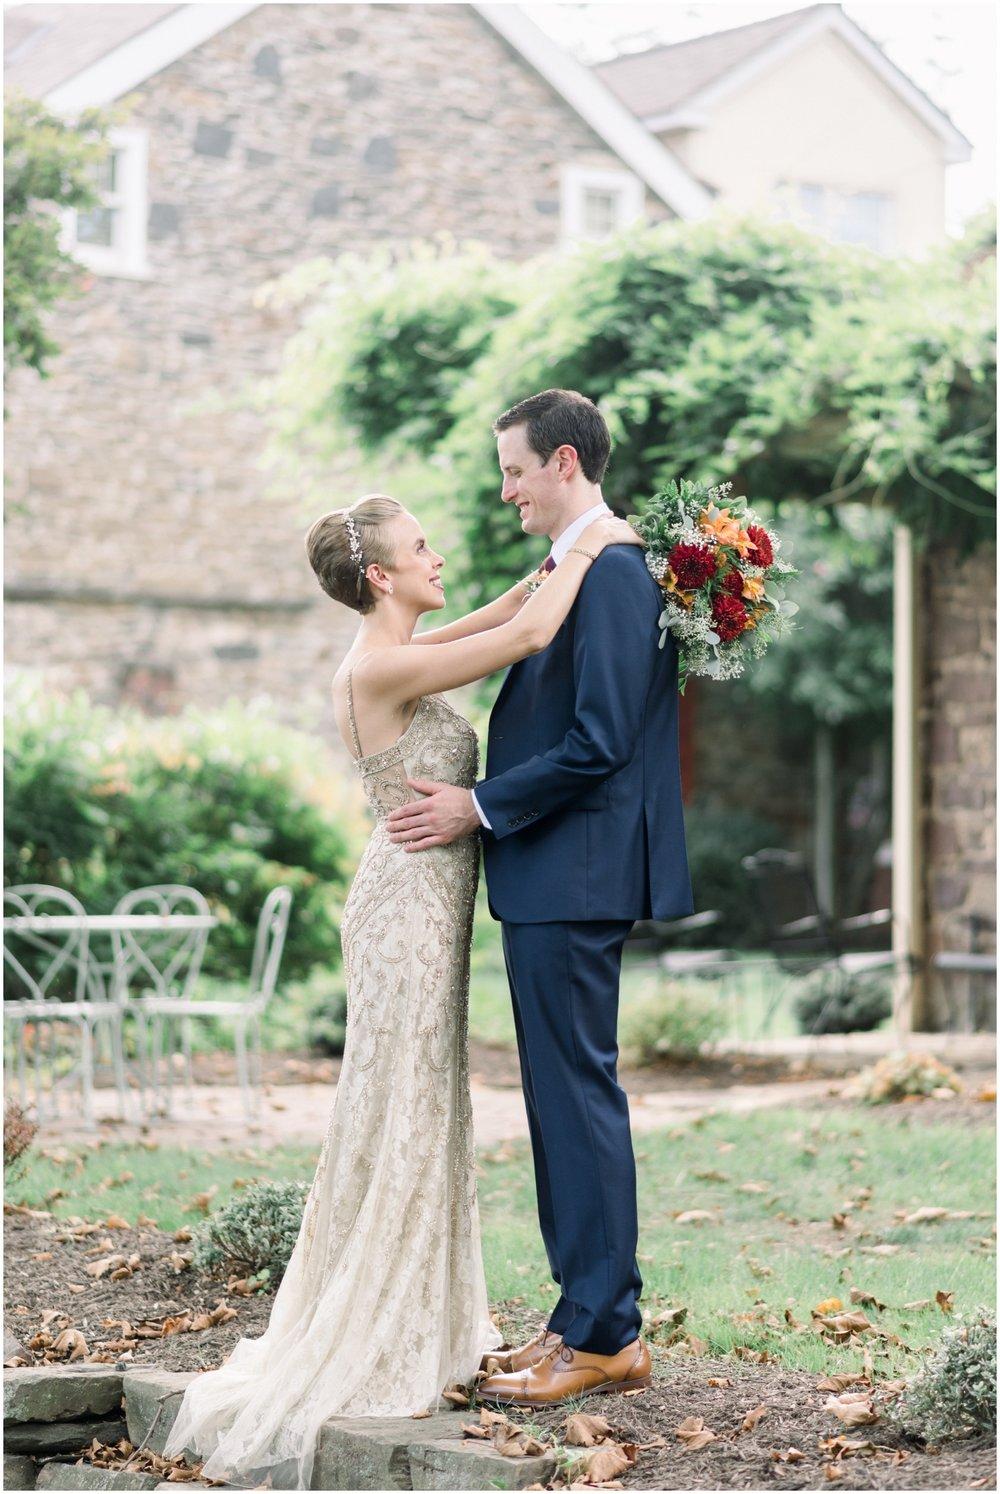 Summer Wedding at Joseph Ambler Inn - Krista Brackin Photography_0076.jpg